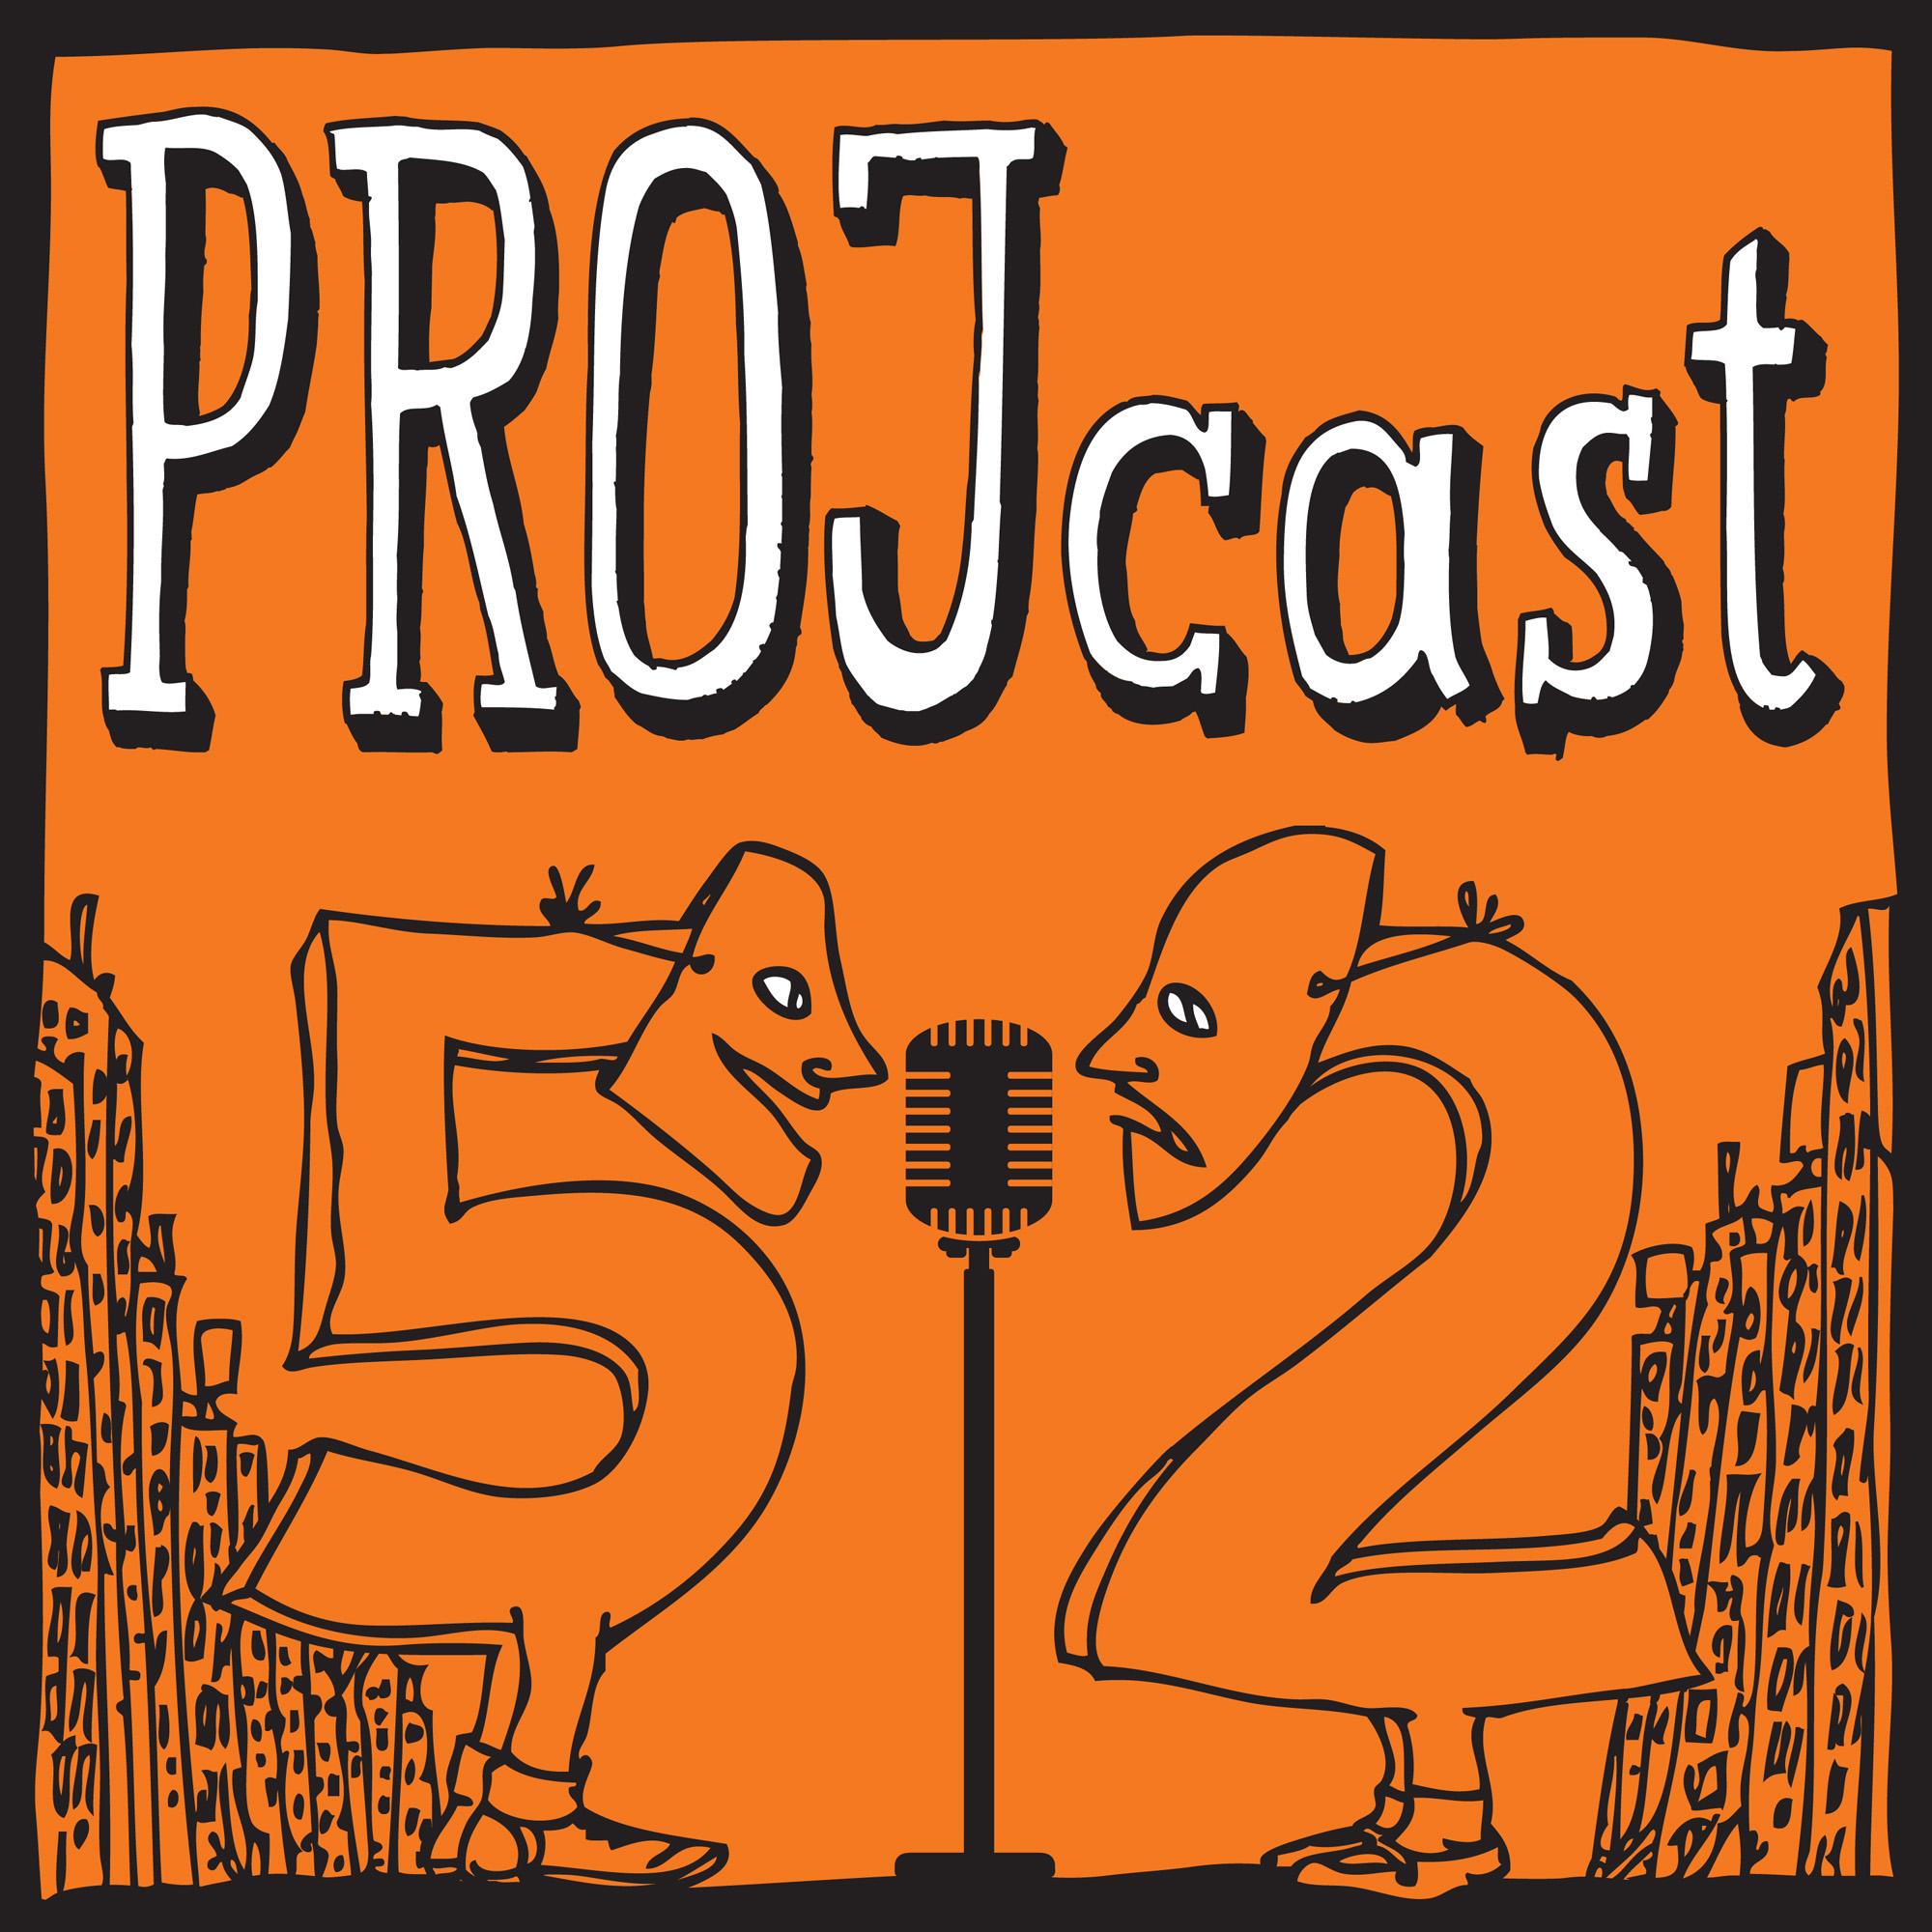 The PROJcast show art